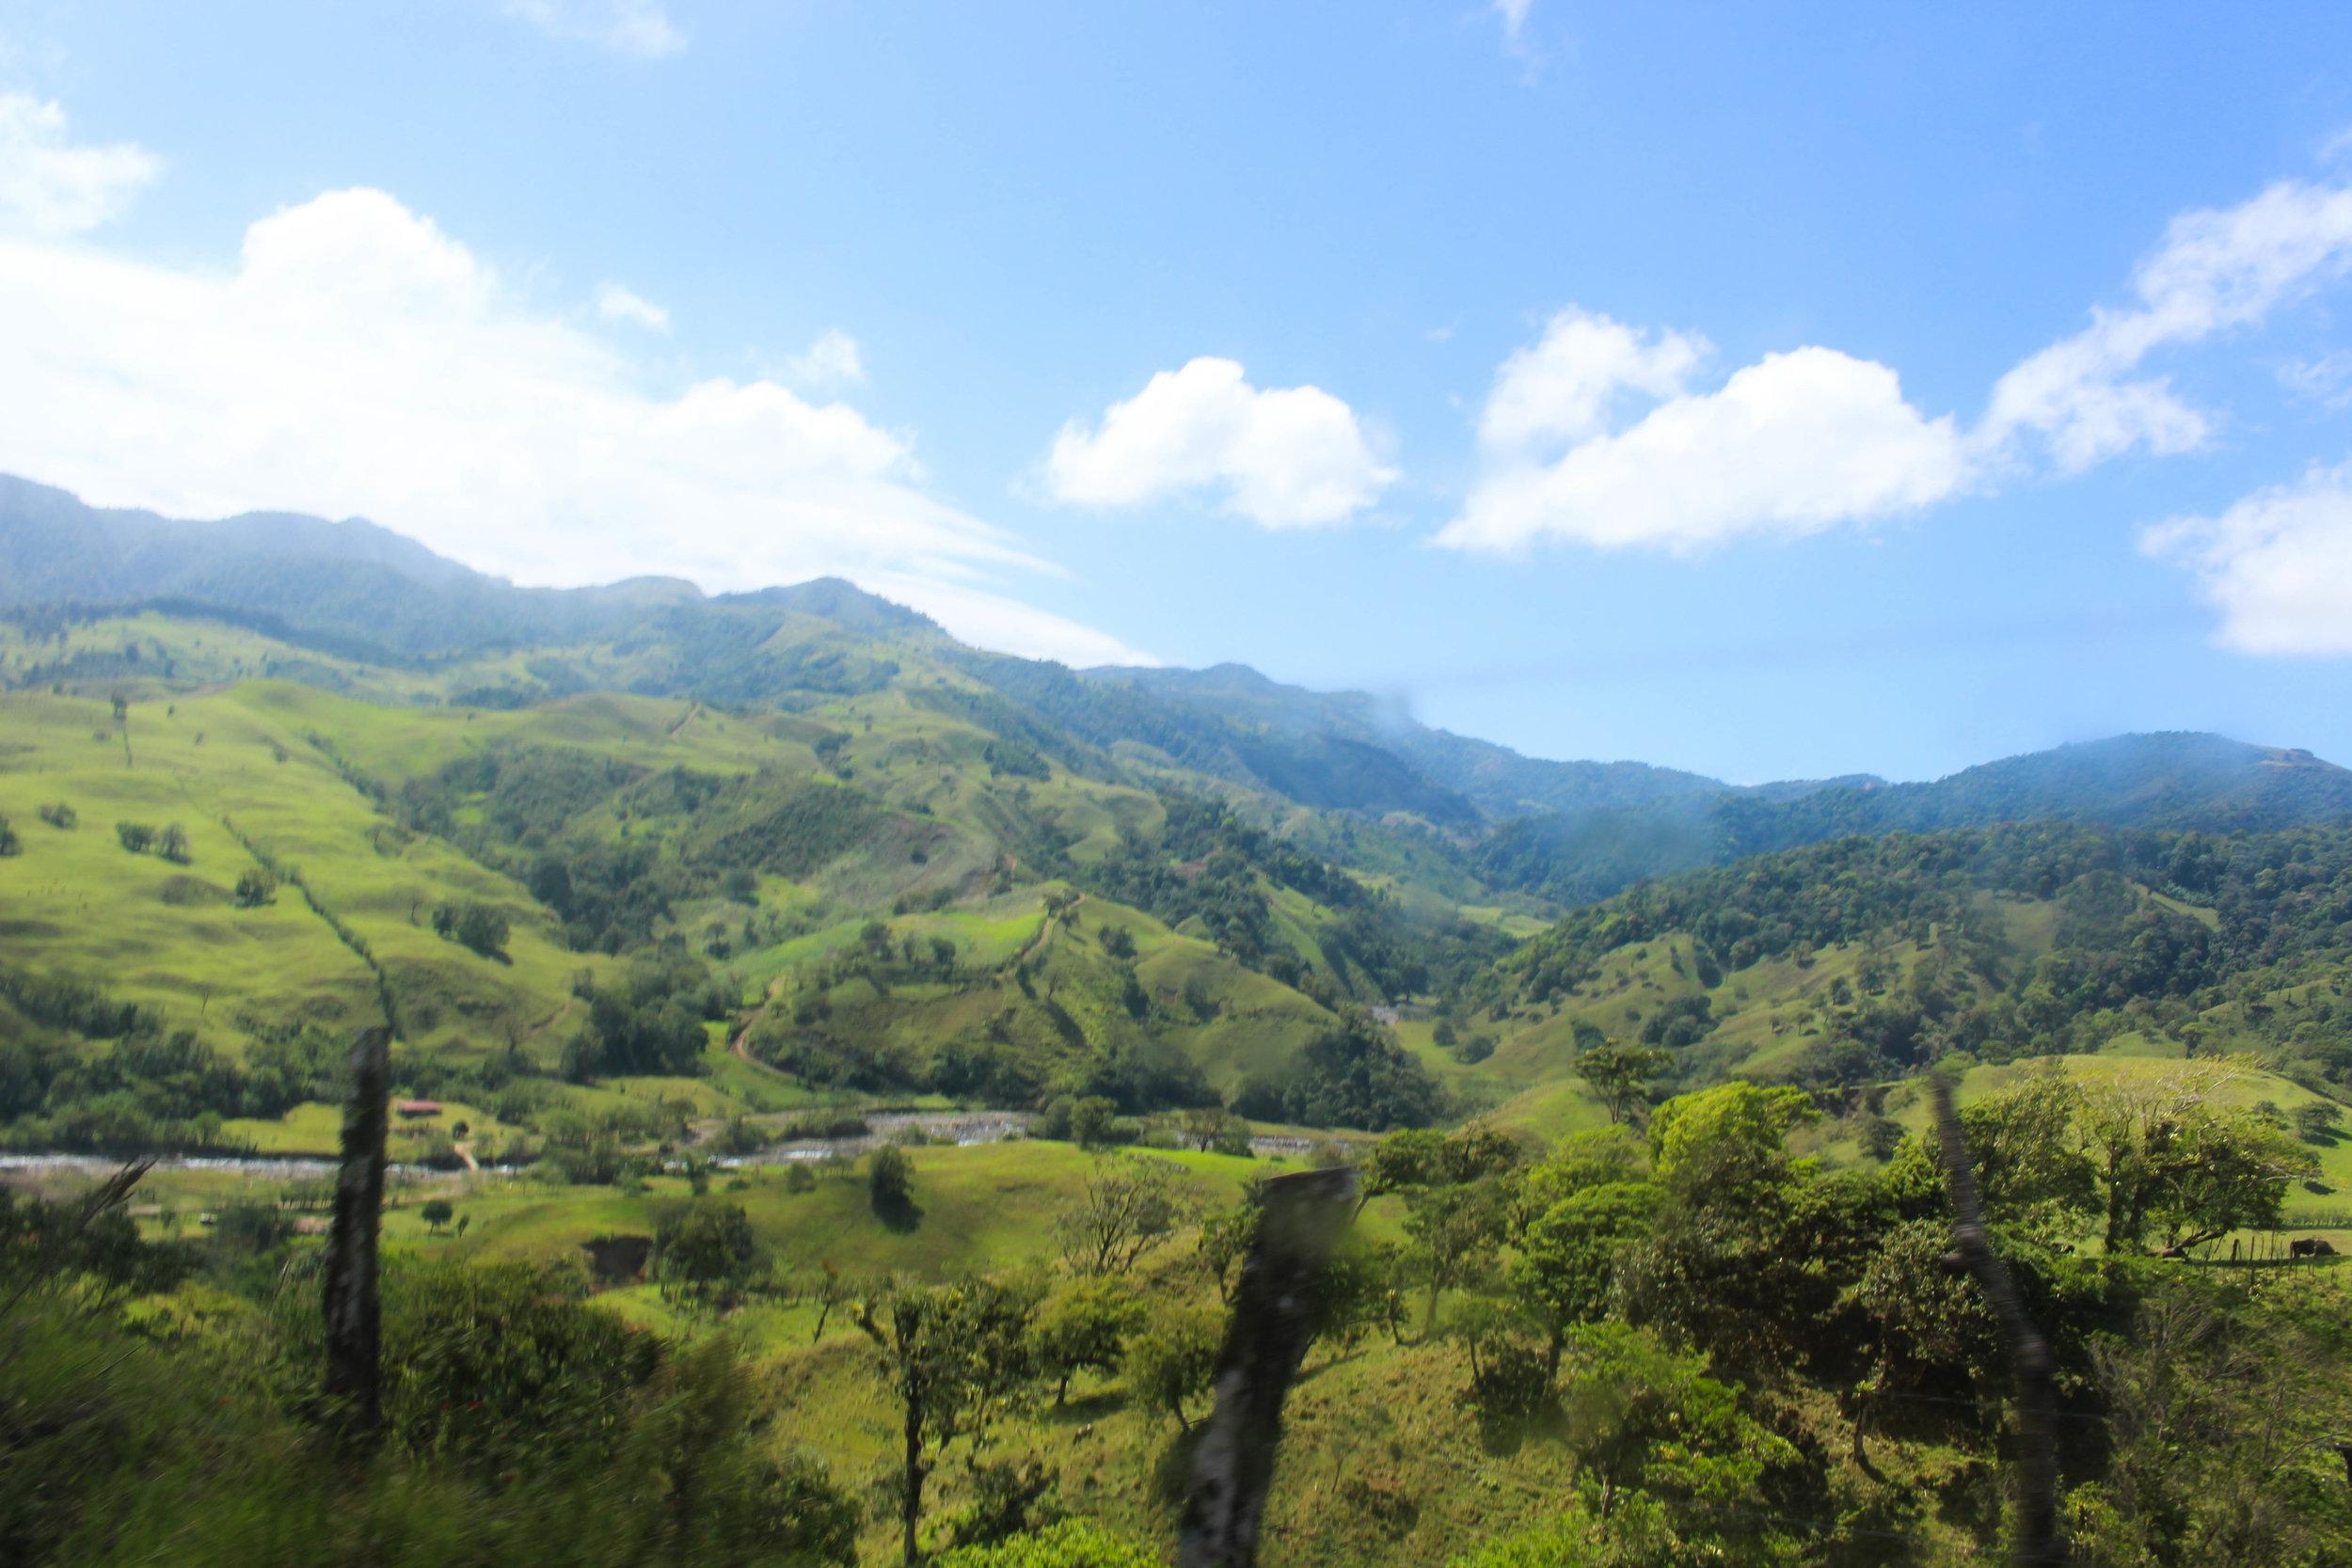 monteverde-hills and sky-NatalieNehlawi.jpg